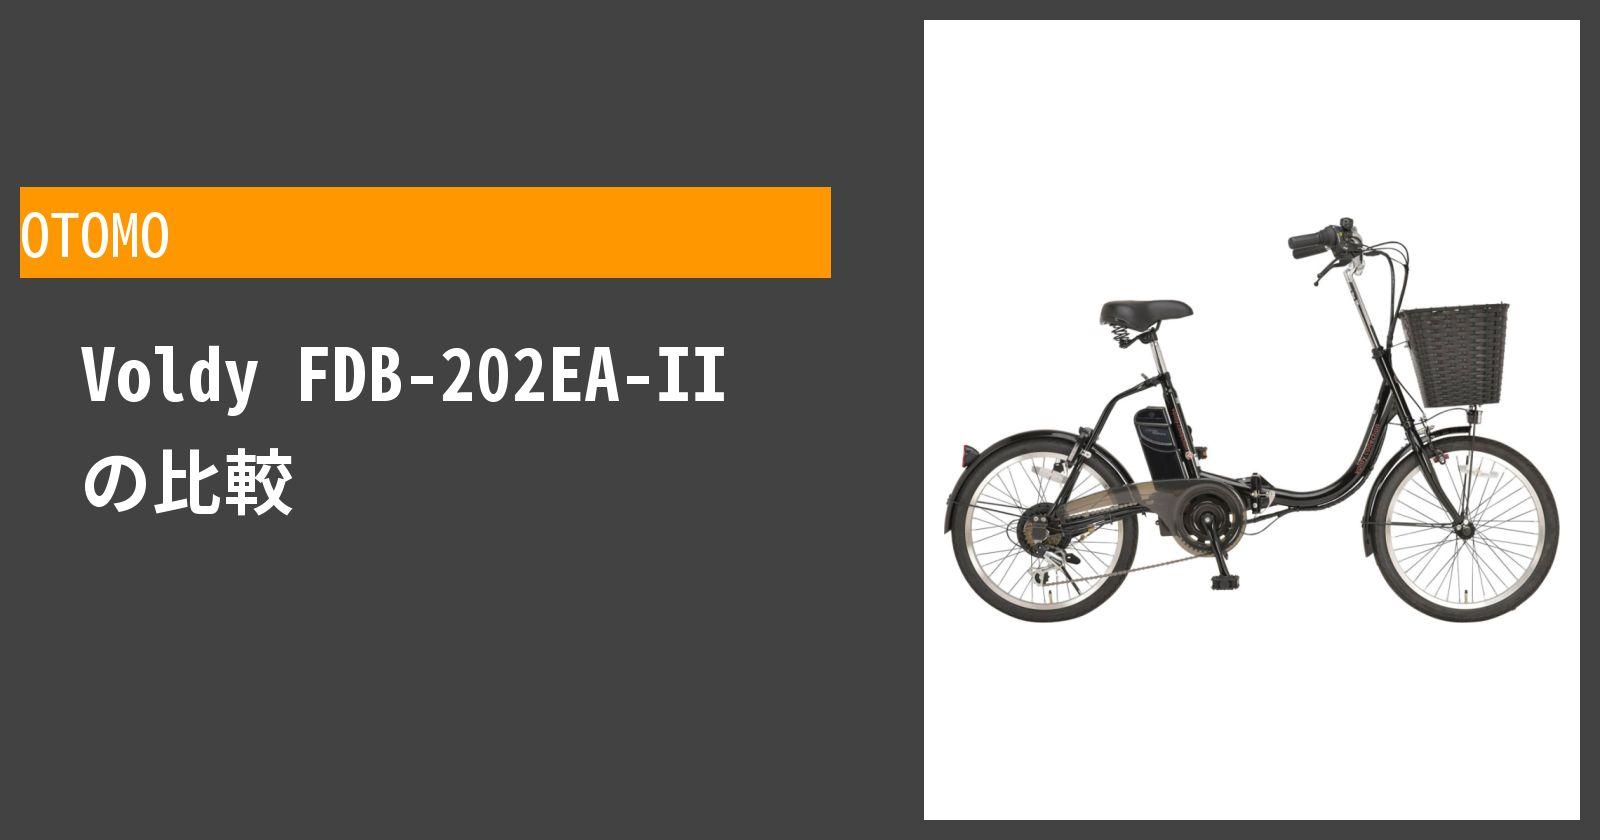 Voldy FDB-202EA-IIを徹底評価